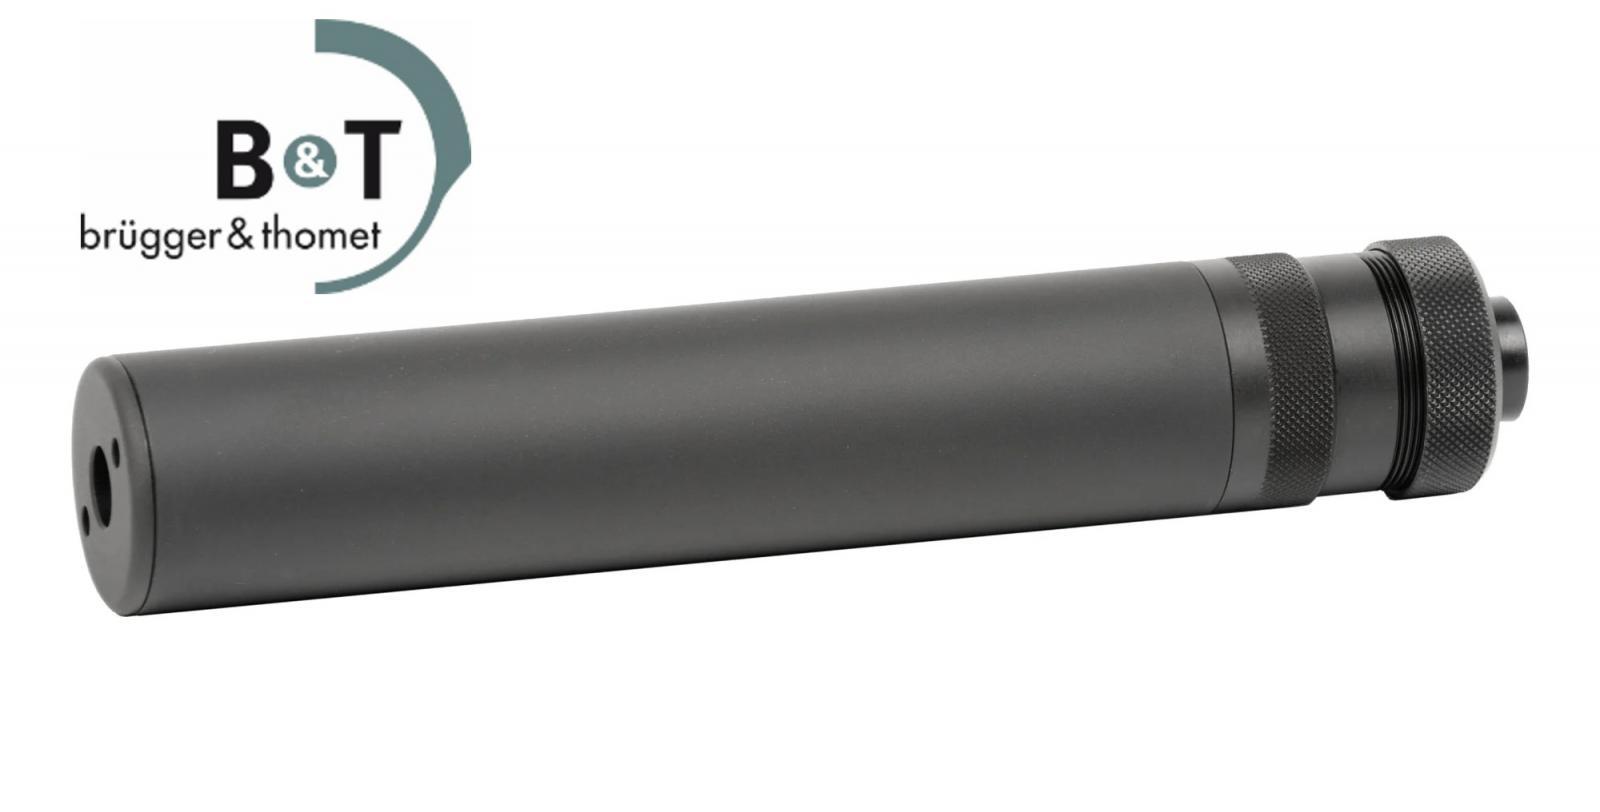 Silencieux BRUGGER & THOMET IMPULS-IIA pour Glock Cal 9mm